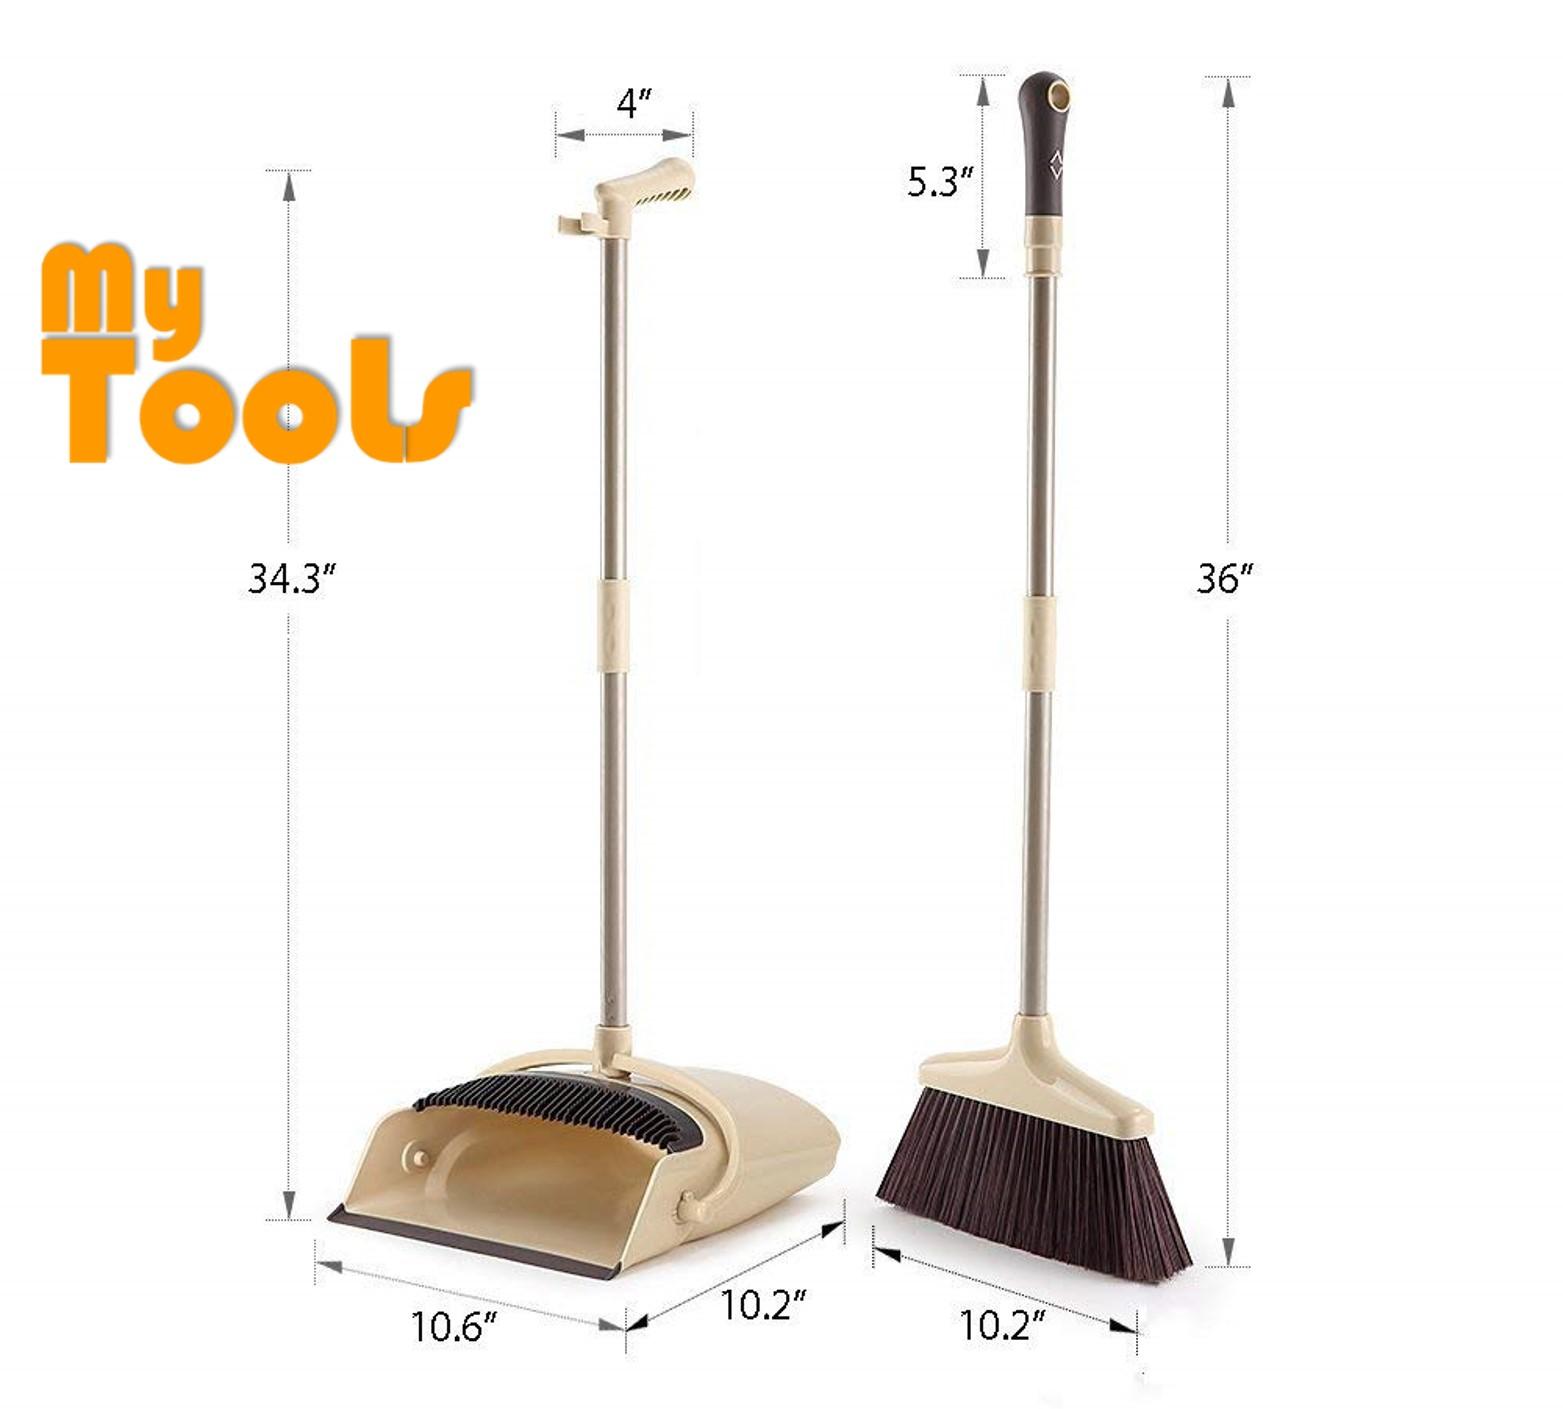 Mytools Windproof Broom And Dustpan Set Combination Soft Bristles Broom